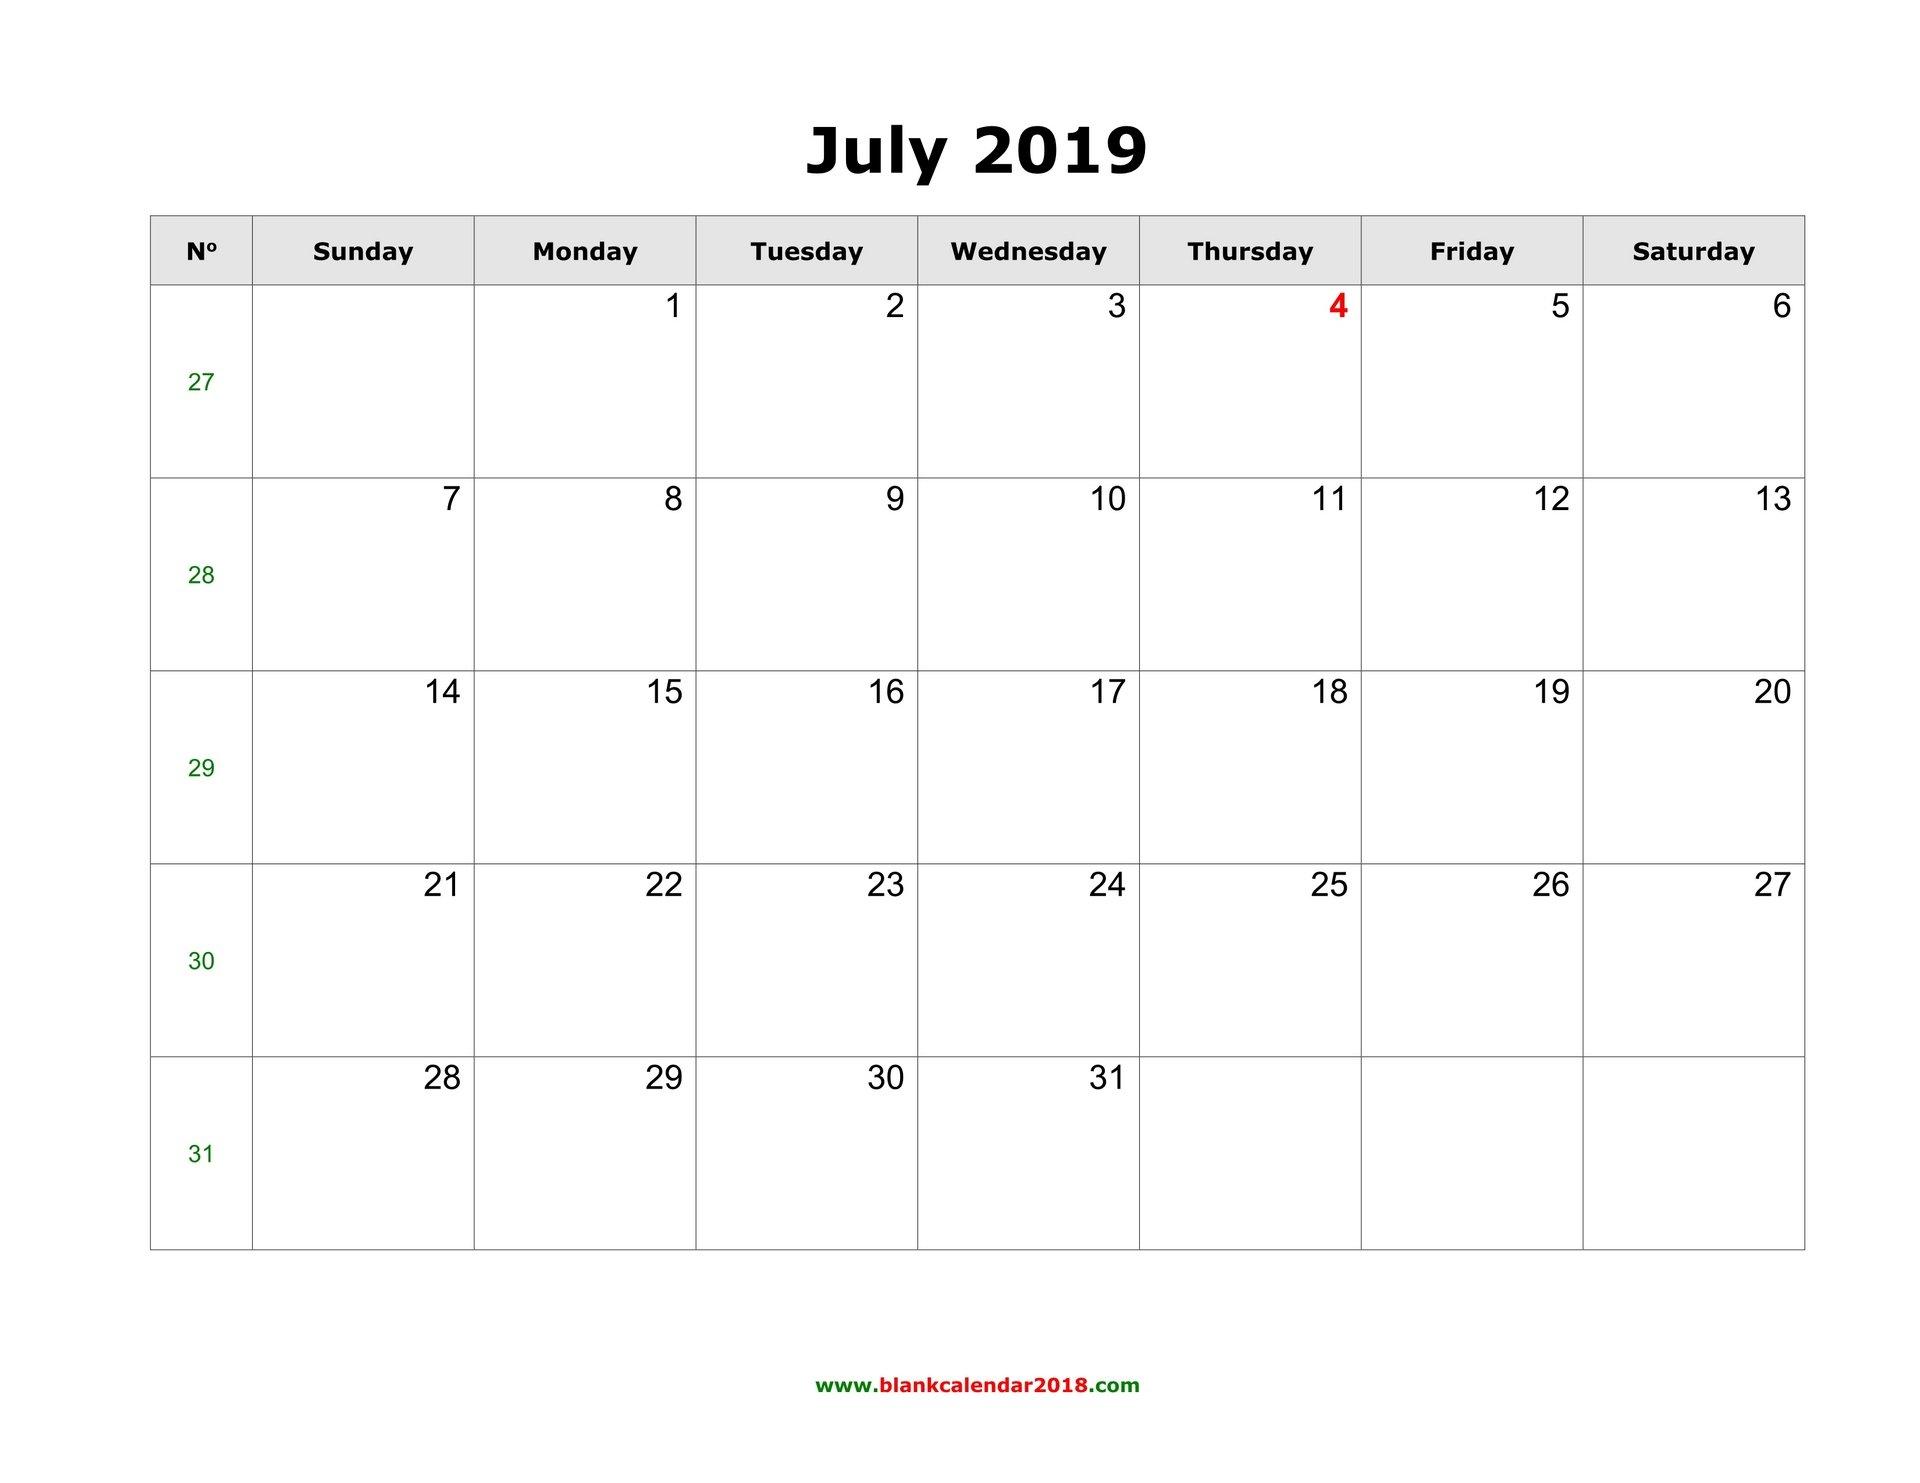 Blank Calendar For July 2019 Calendar 2019 Editable